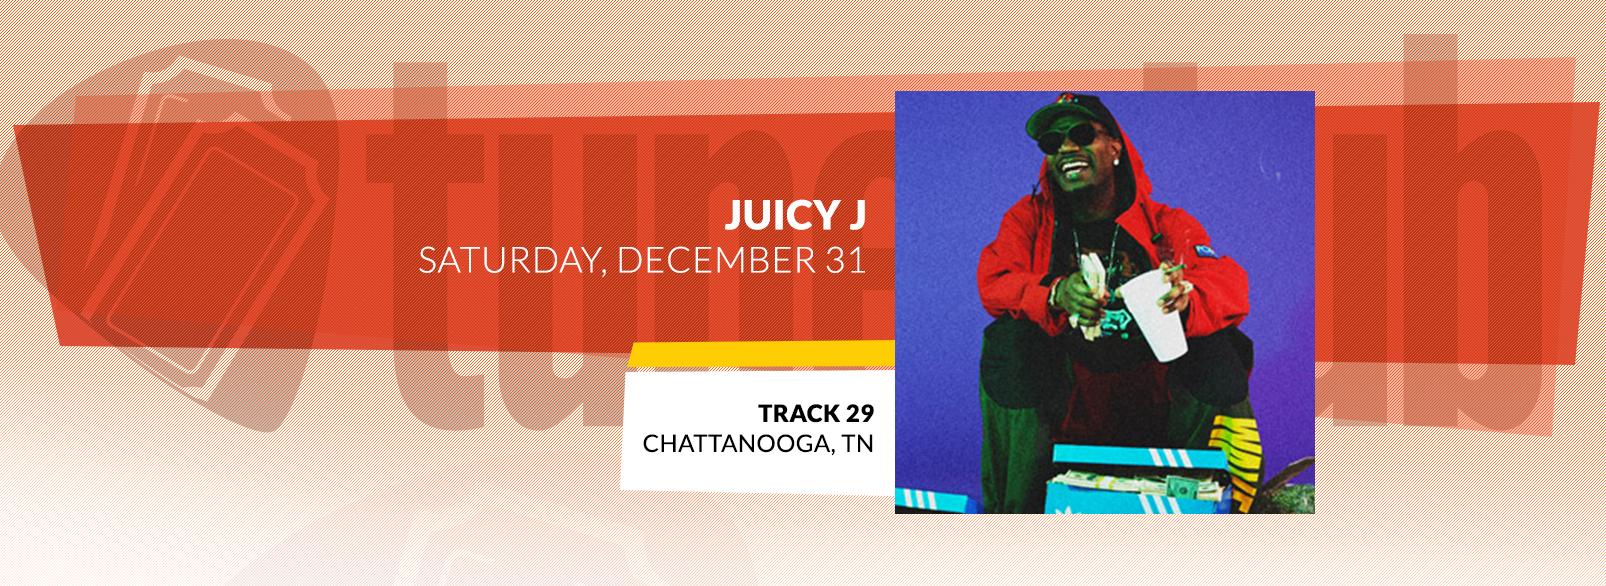 Juicy J @ Track 29